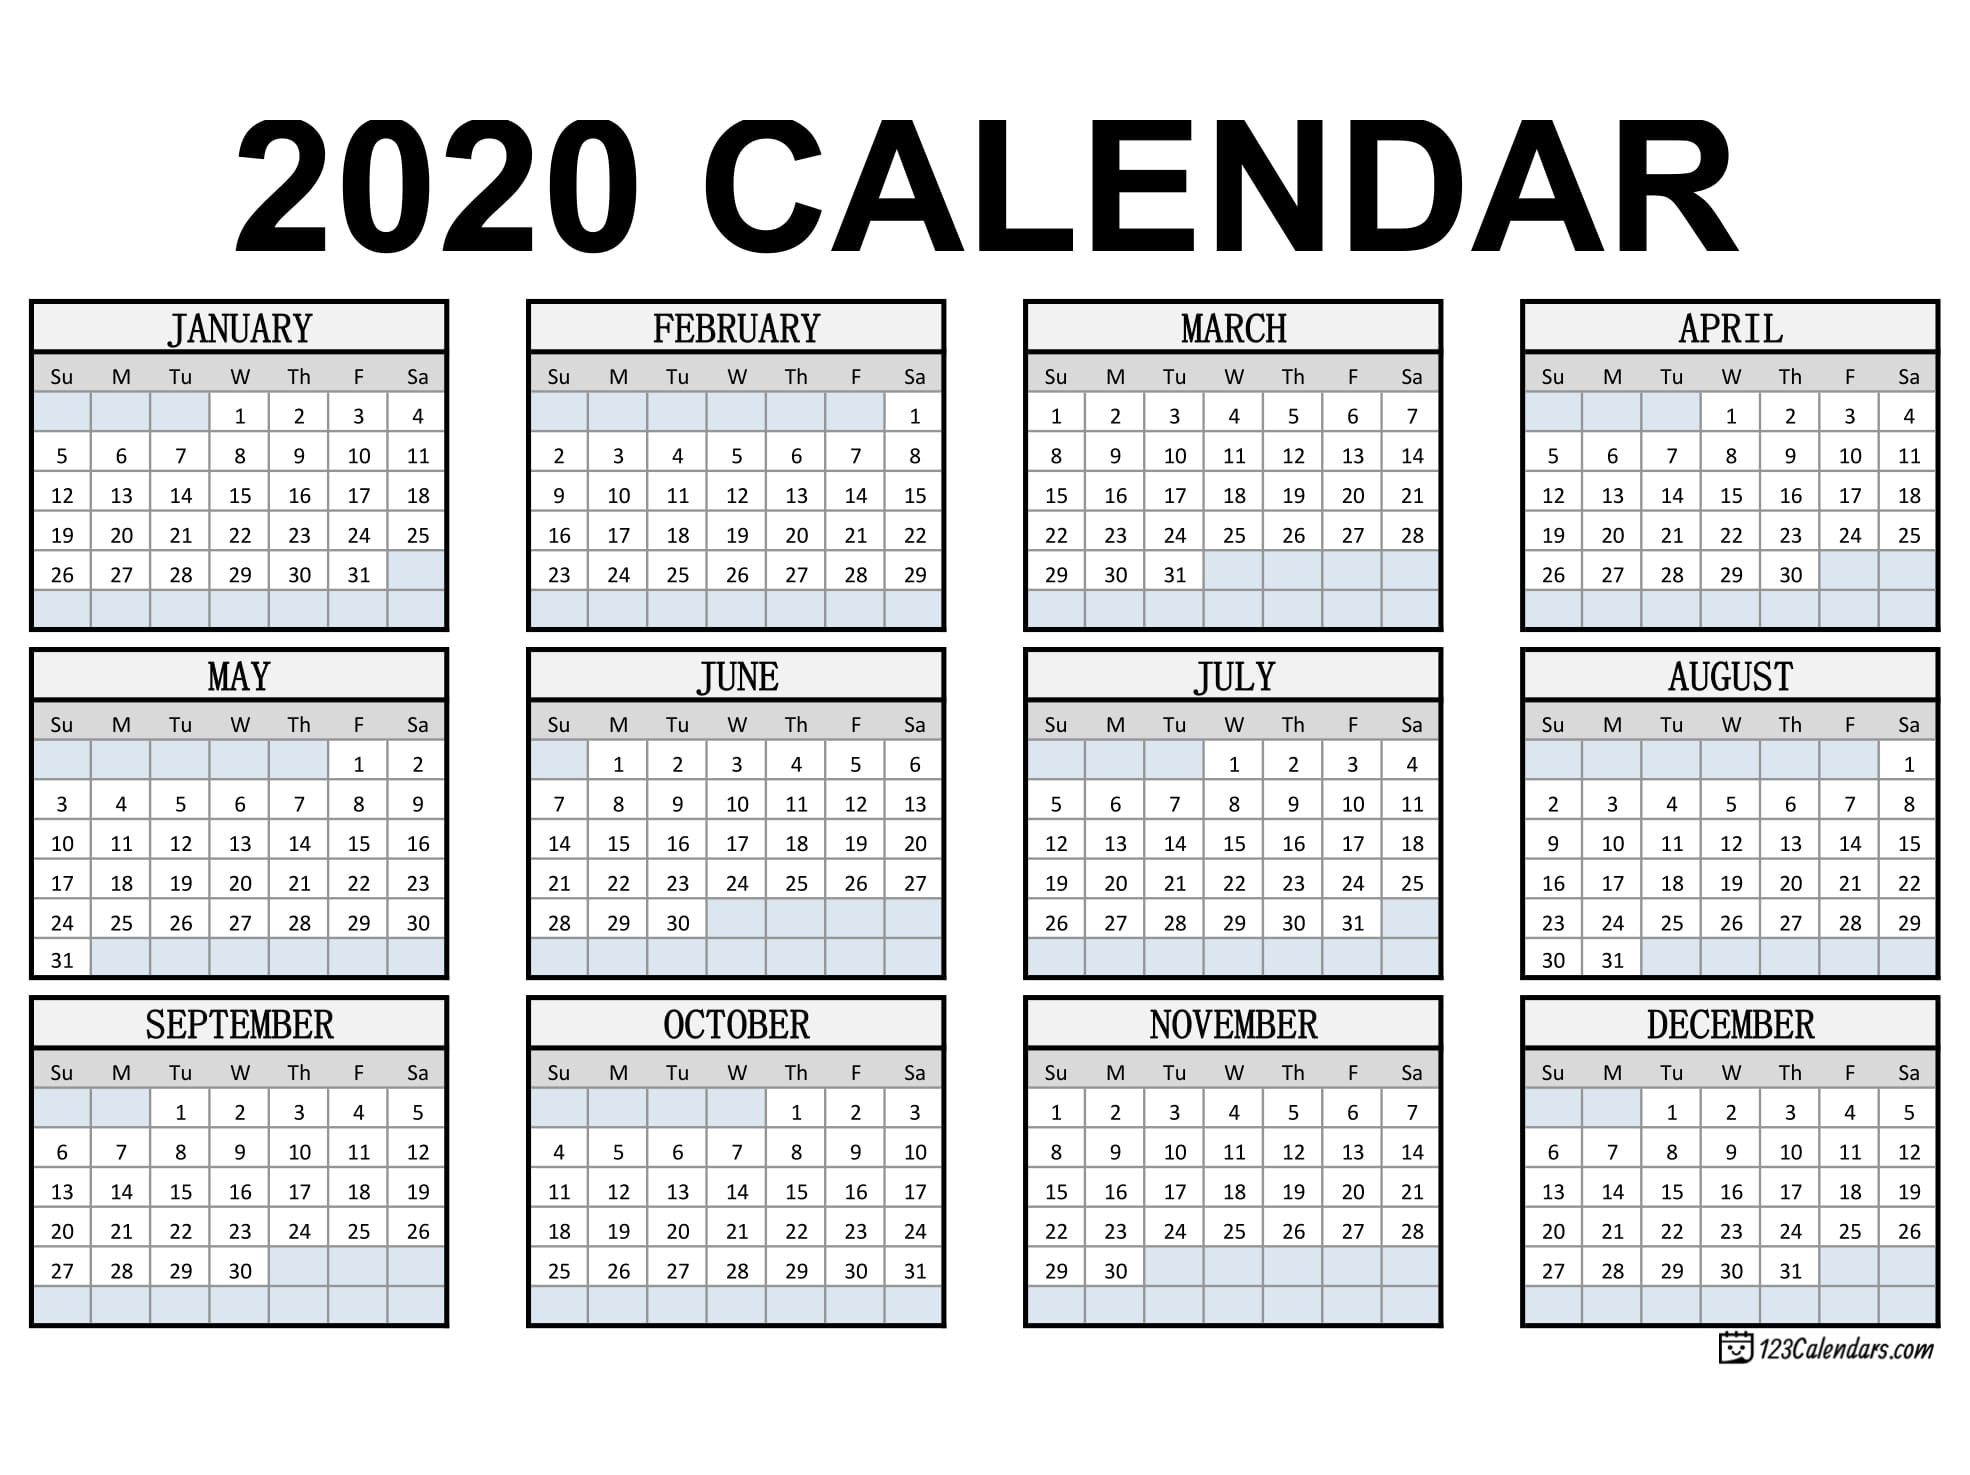 Free Printable 2020 Calendar | 123Calendars with Printable 2020 Wallet Calendar